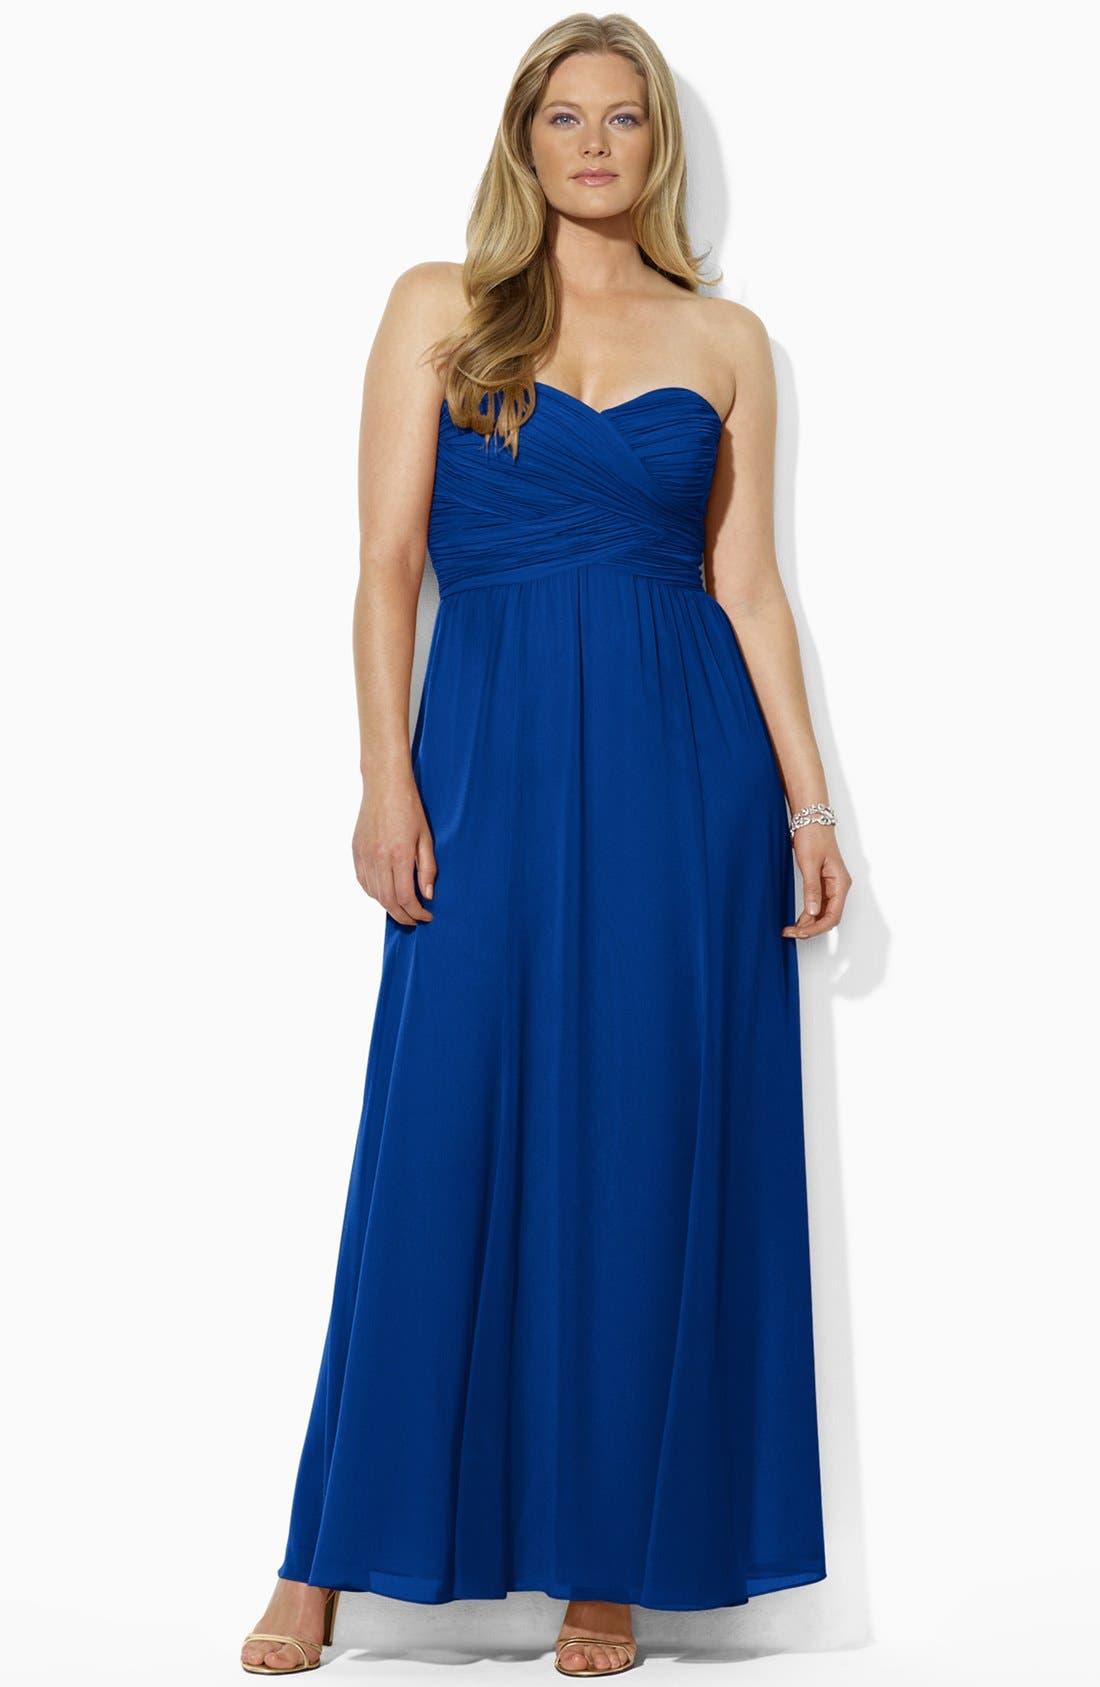 Alternate Image 1 Selected - Lauren Ralph Lauren Strapless Georgette Gown (Plus Size)